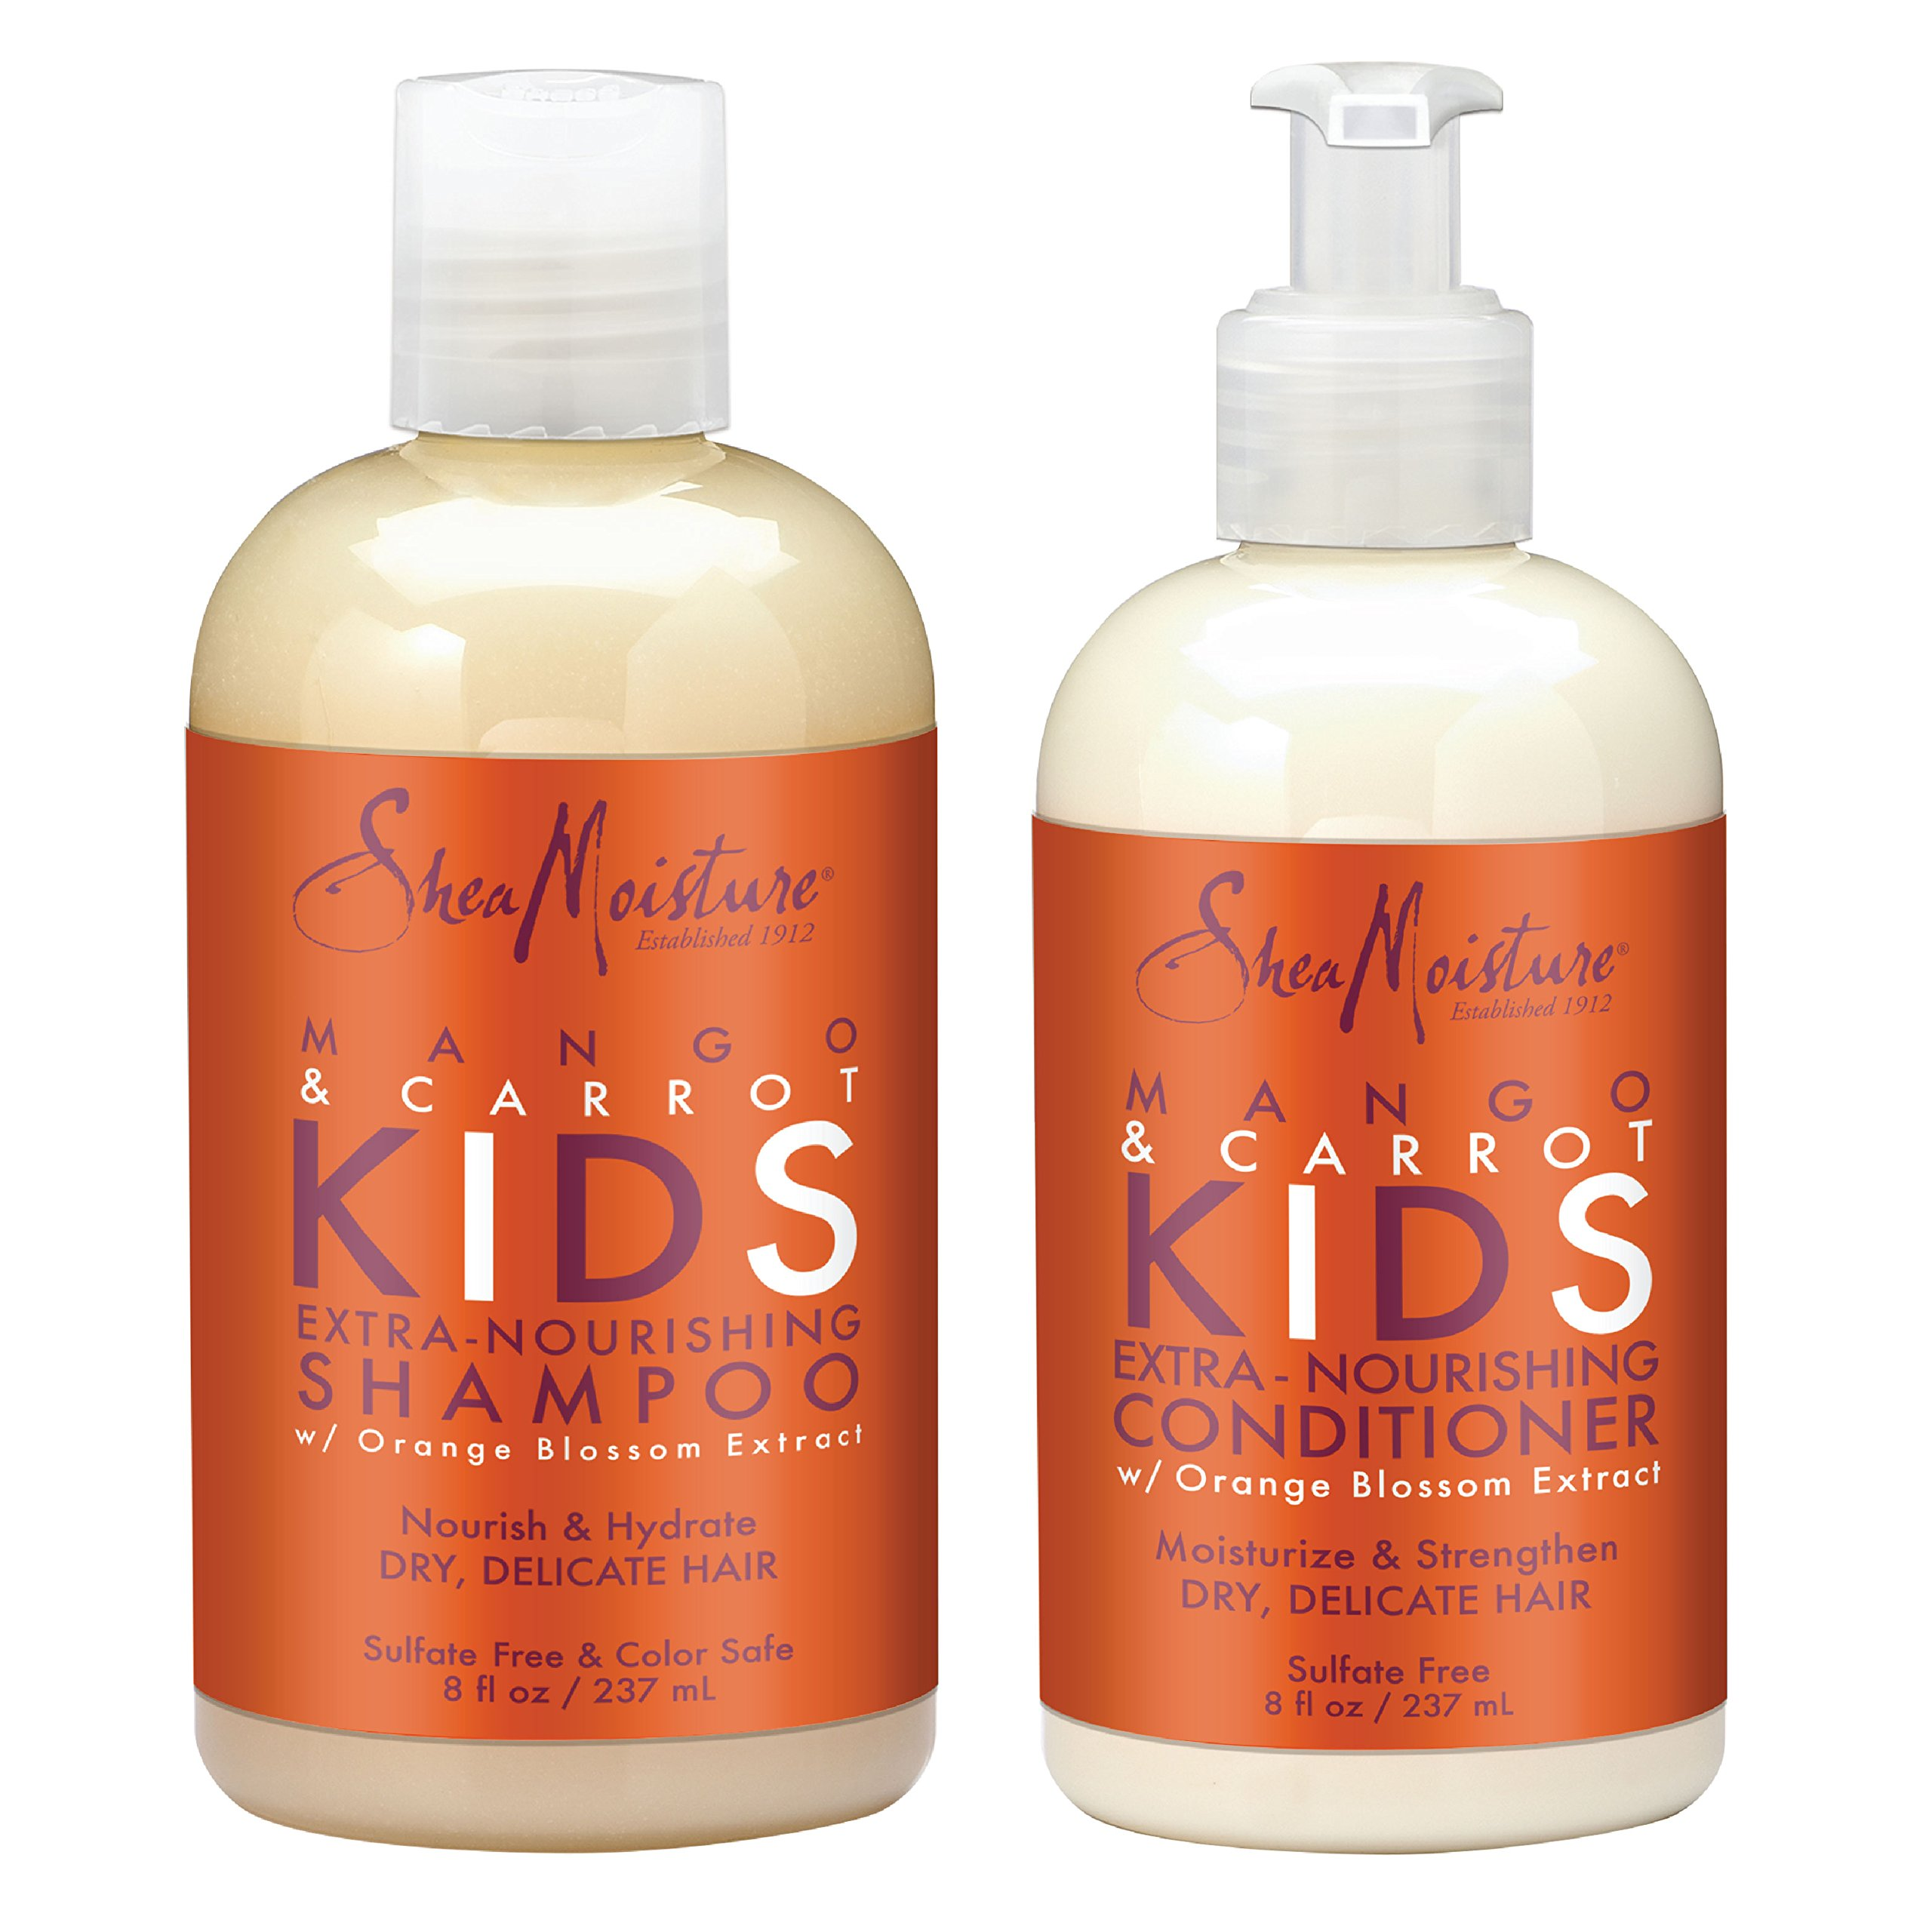 SheaMoisture Mango & Carrot KIDS, Extra-Nourishing, Shampoo and Conditioner, Orange Blossom Extract, Dry, Delicate Hair, 8 fl oz Each by Shea Moisture